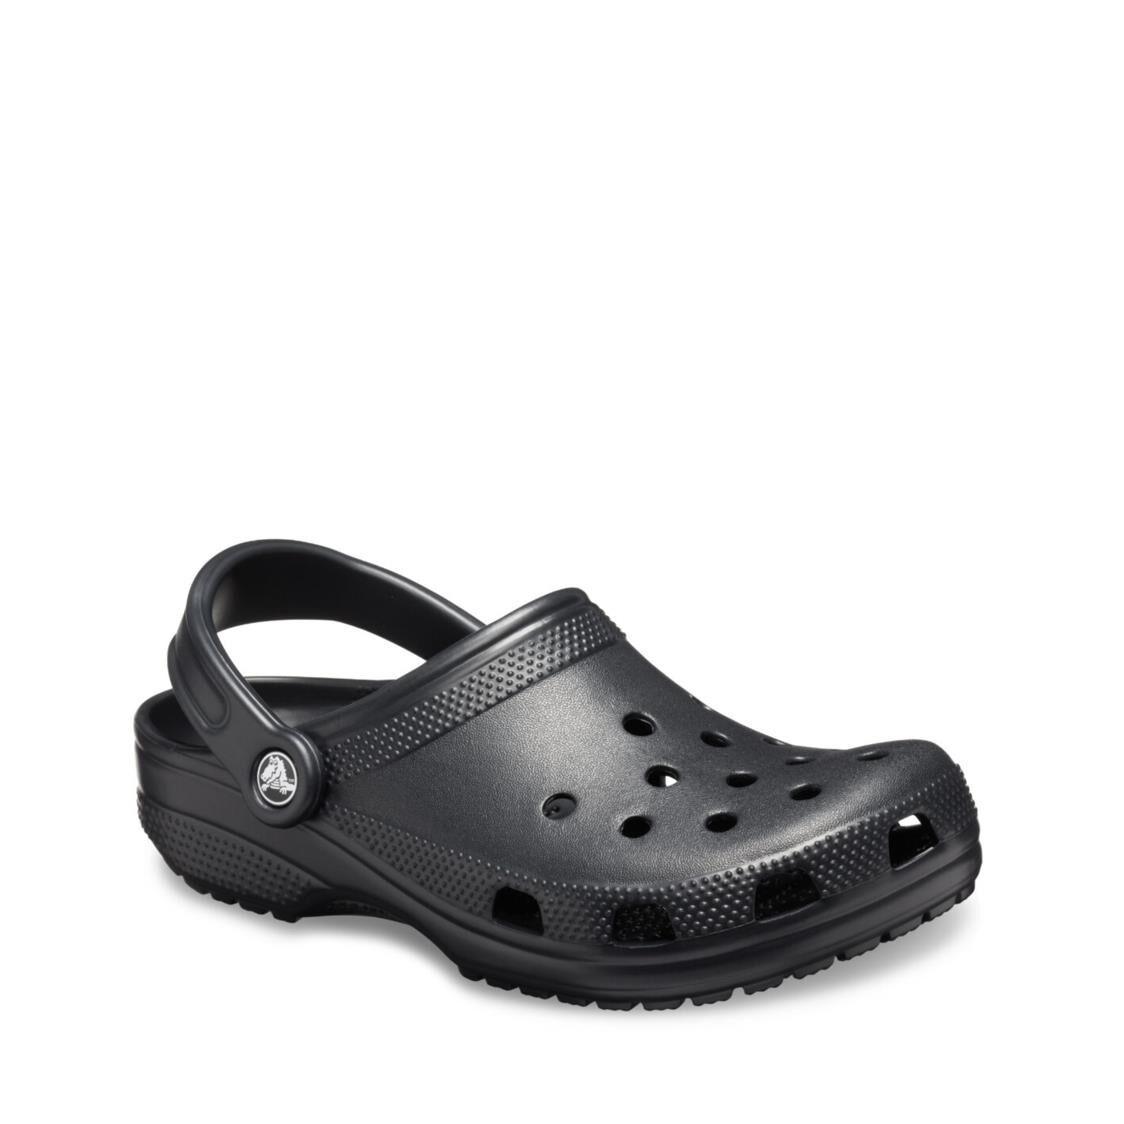 Crocs Classic 10001-001 Black